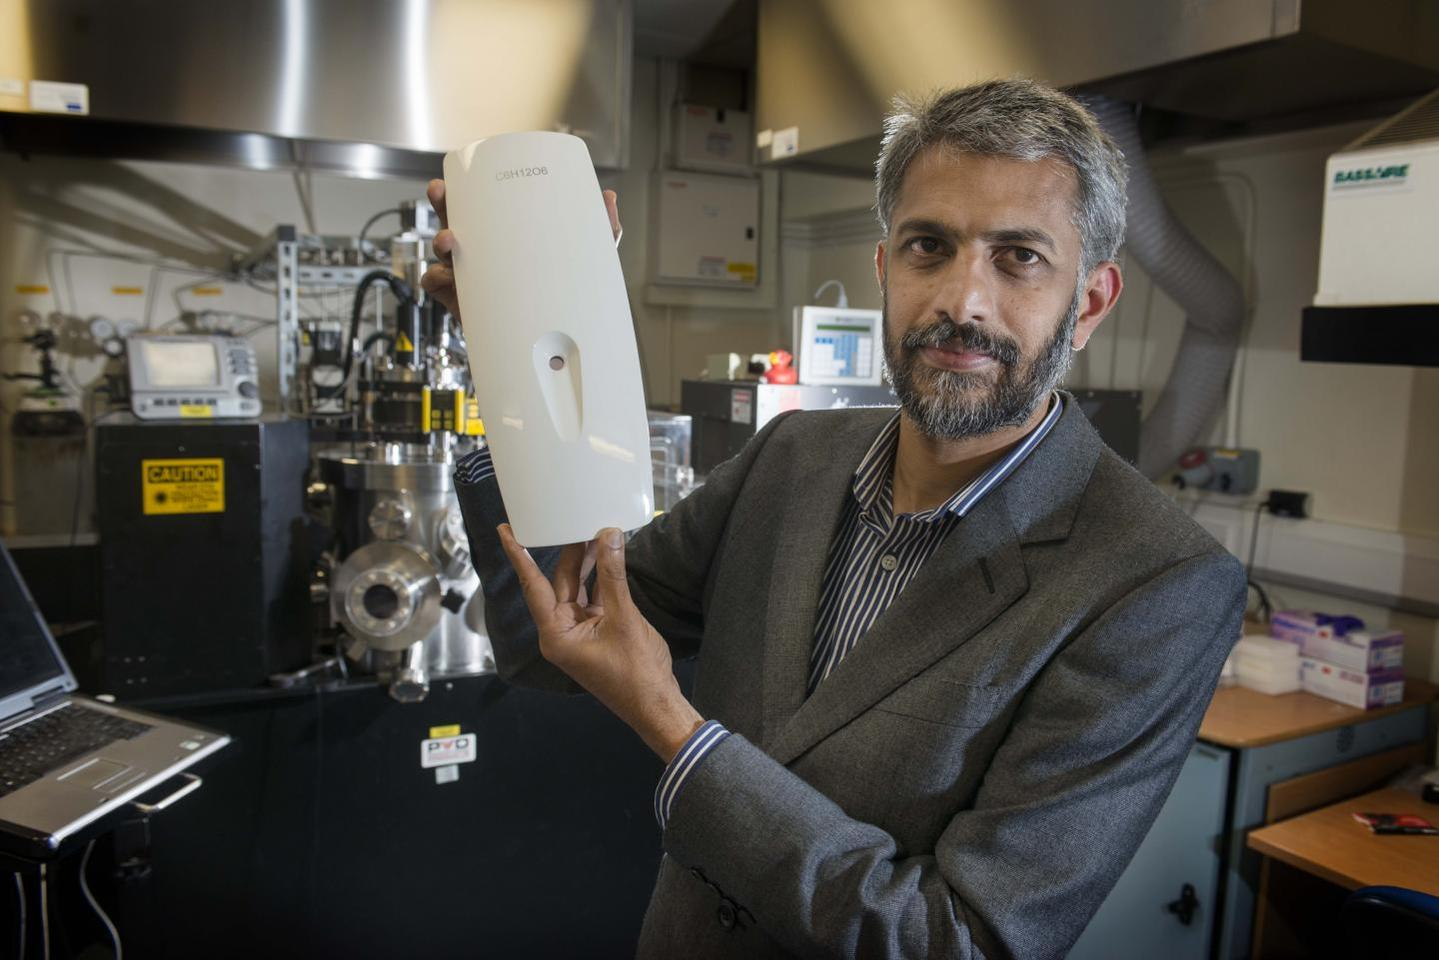 Prof. Gin Jose with the GlucoSense prototype